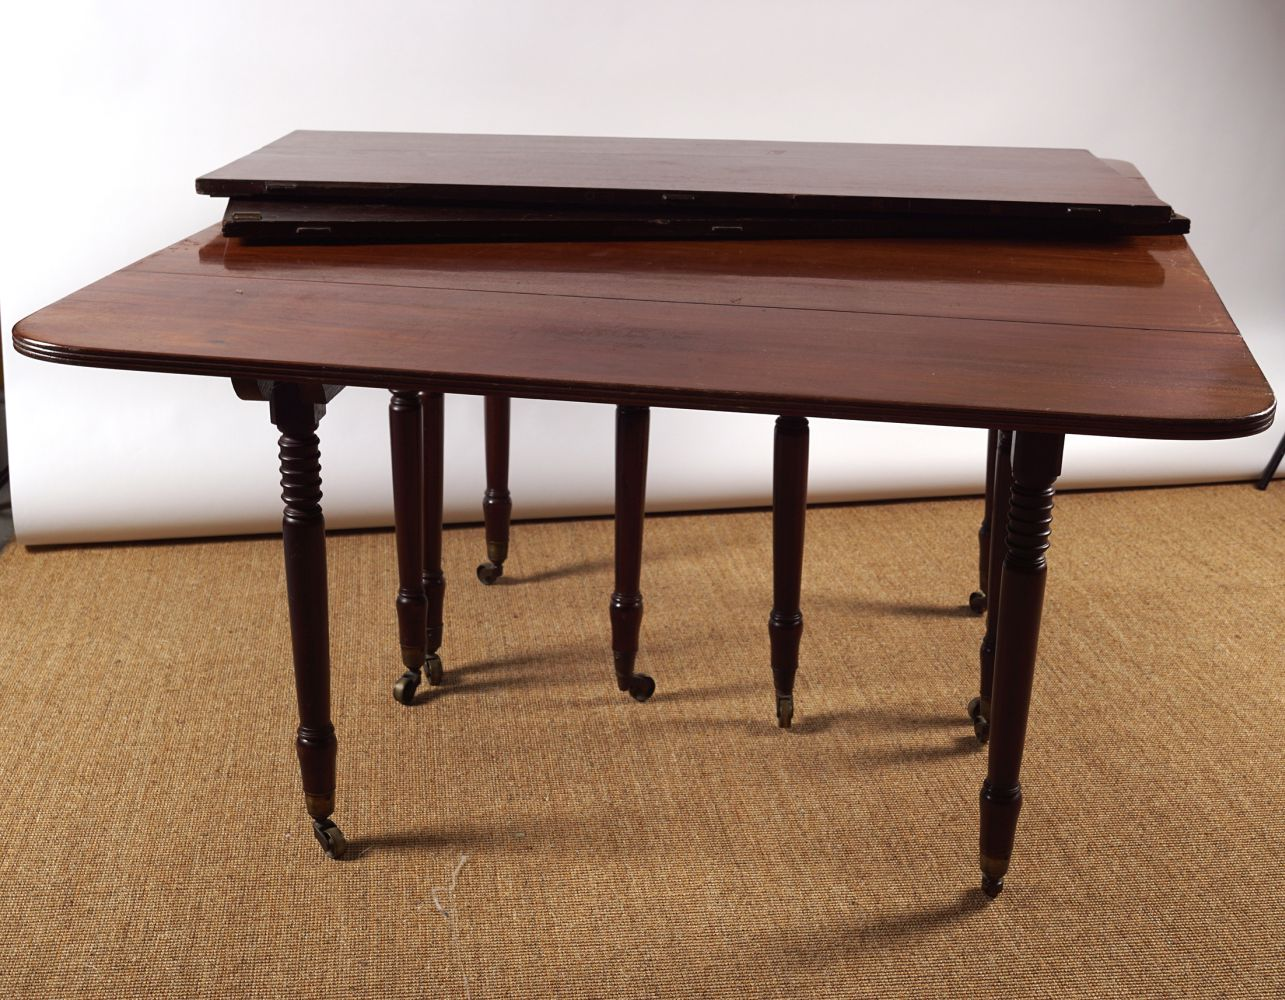 REGENCY PERIOD MAHOGANY DINING TABLE - Image 7 of 8